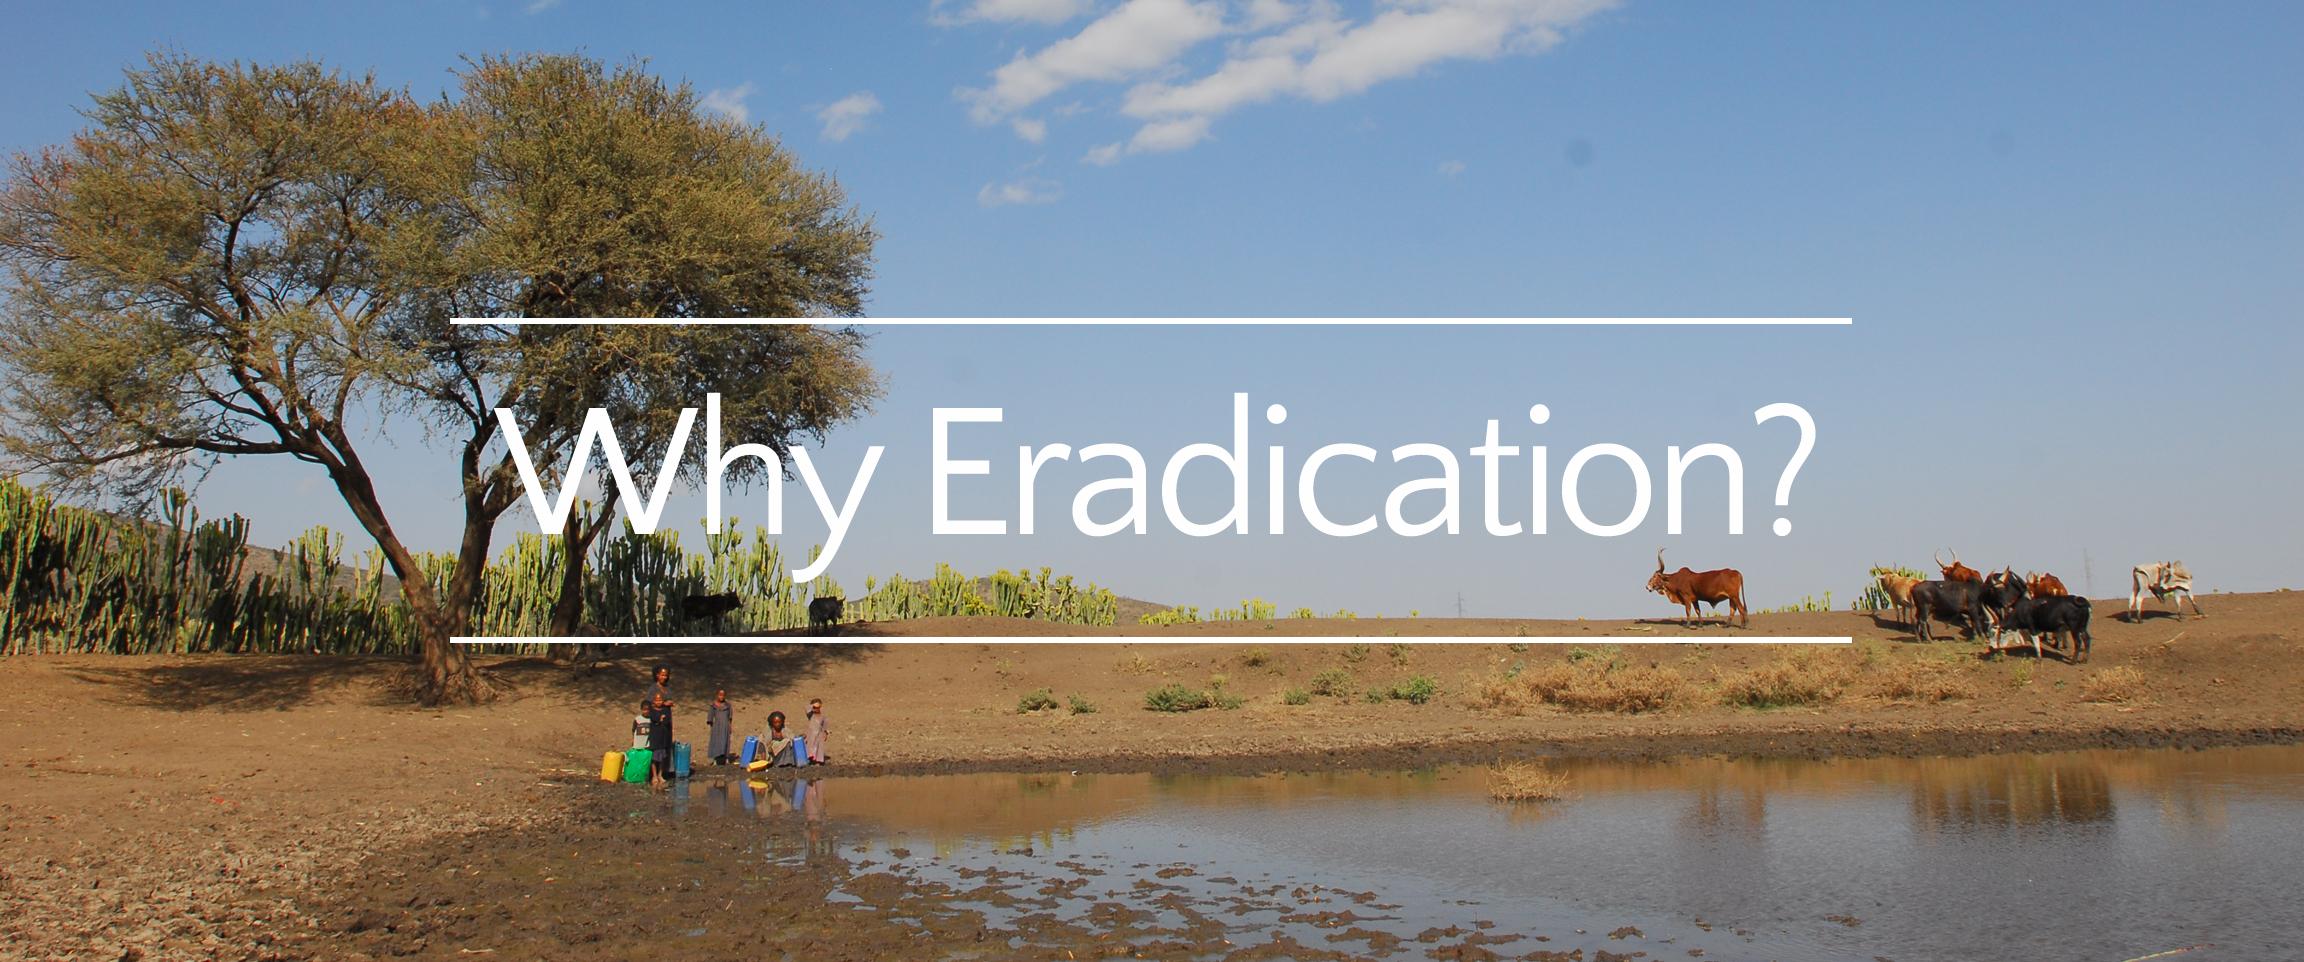 WhyEradication.c.jpg